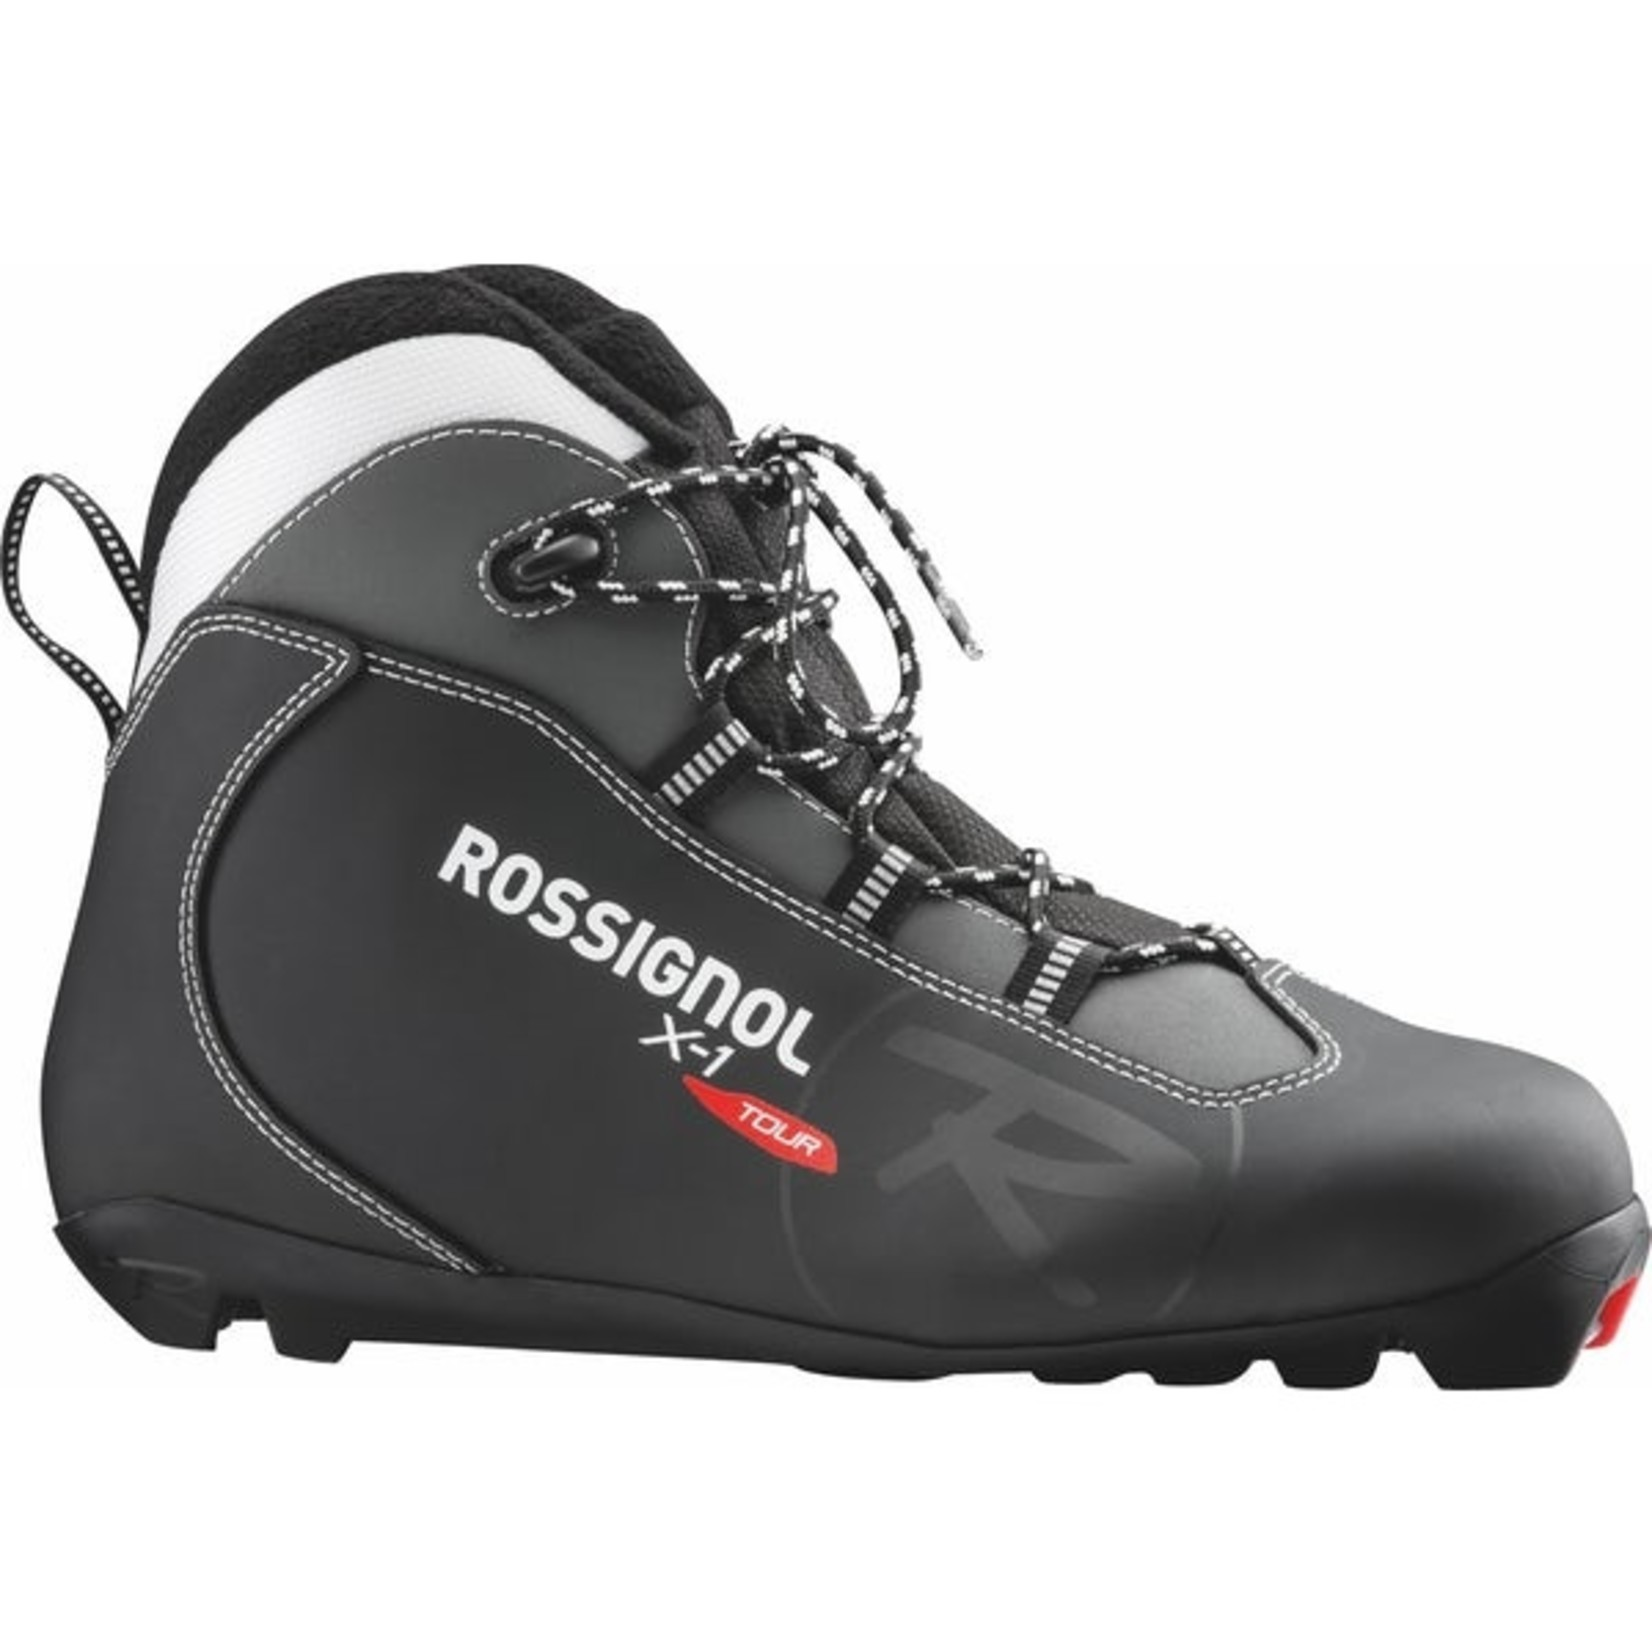 Rossignol Bottes Ski de Fond Rossignol X-1